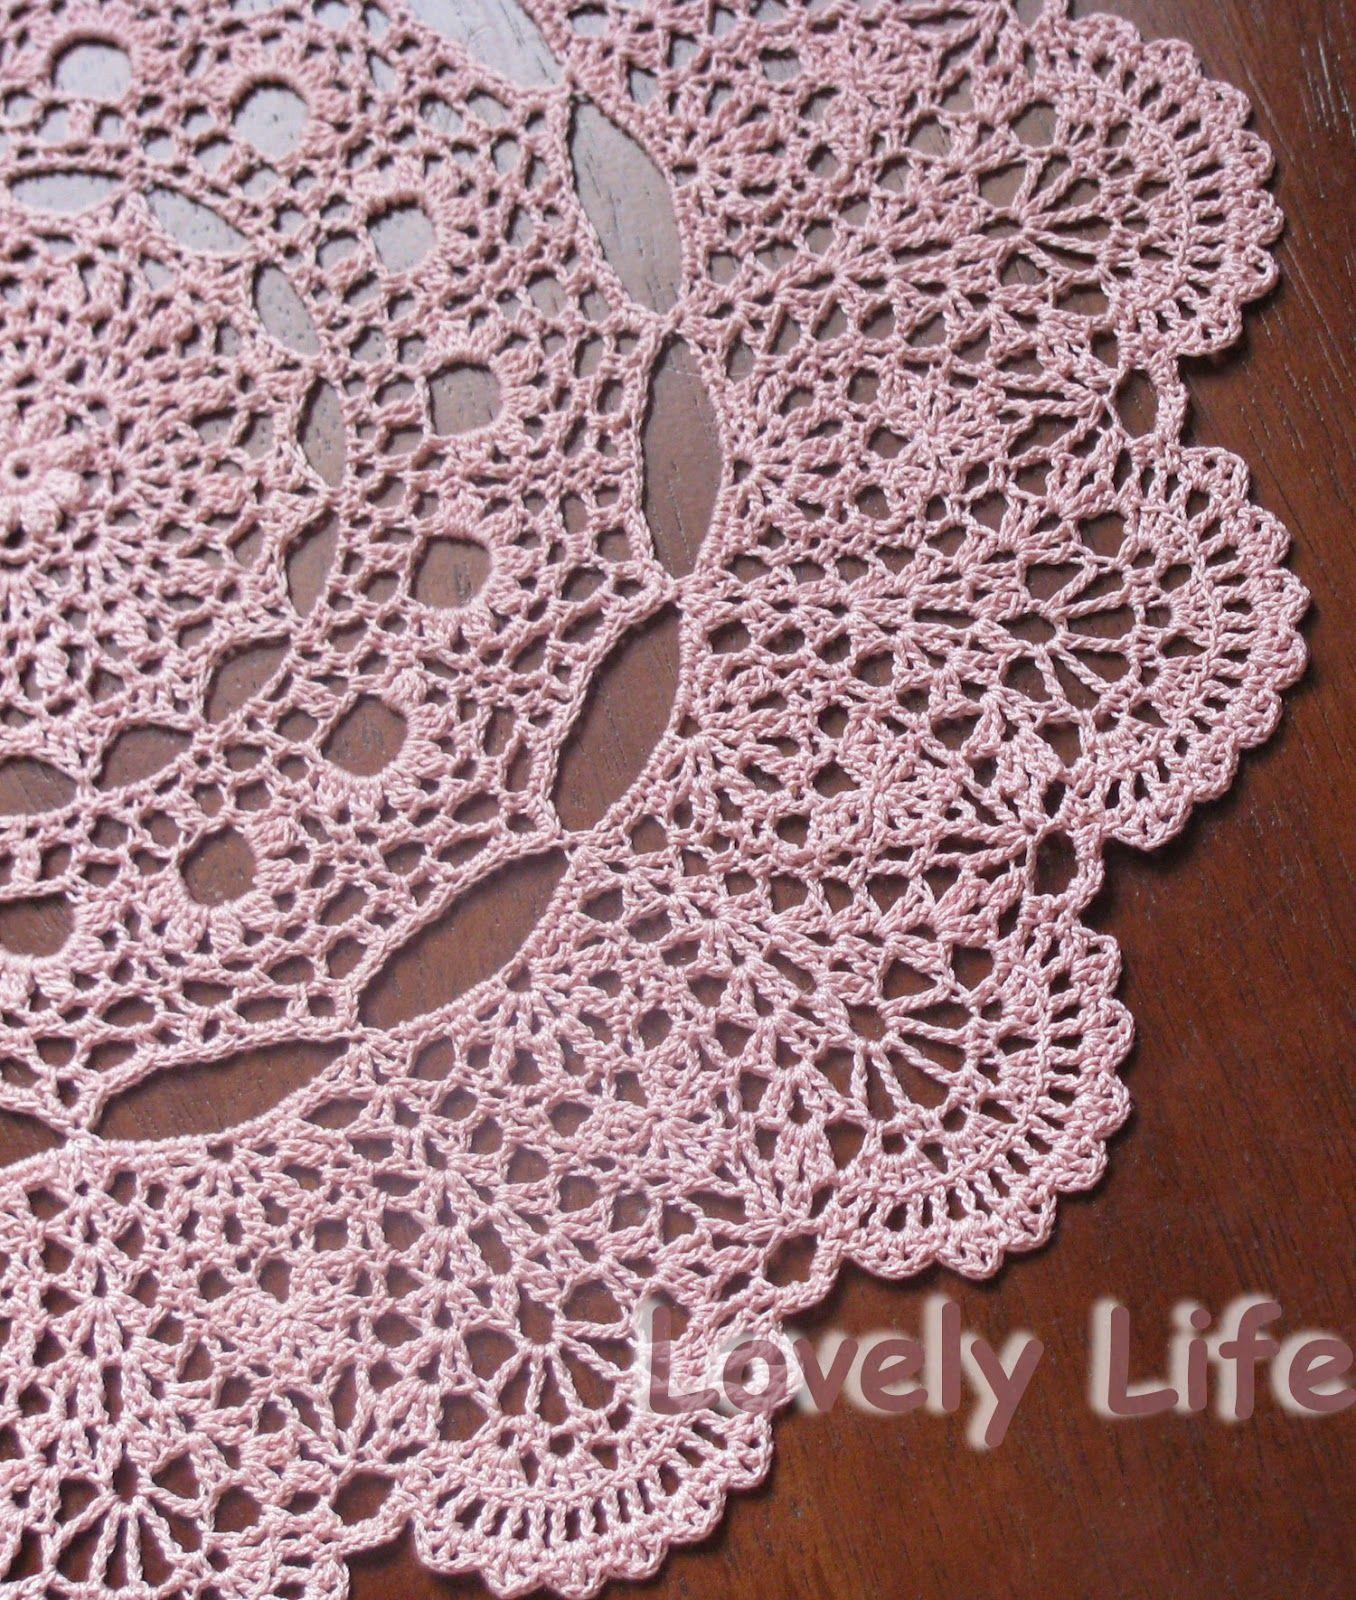 Free Printable Crochet Doily Patterns | Mantilla Doily - Close Up - Free Printable Crochet Patterns